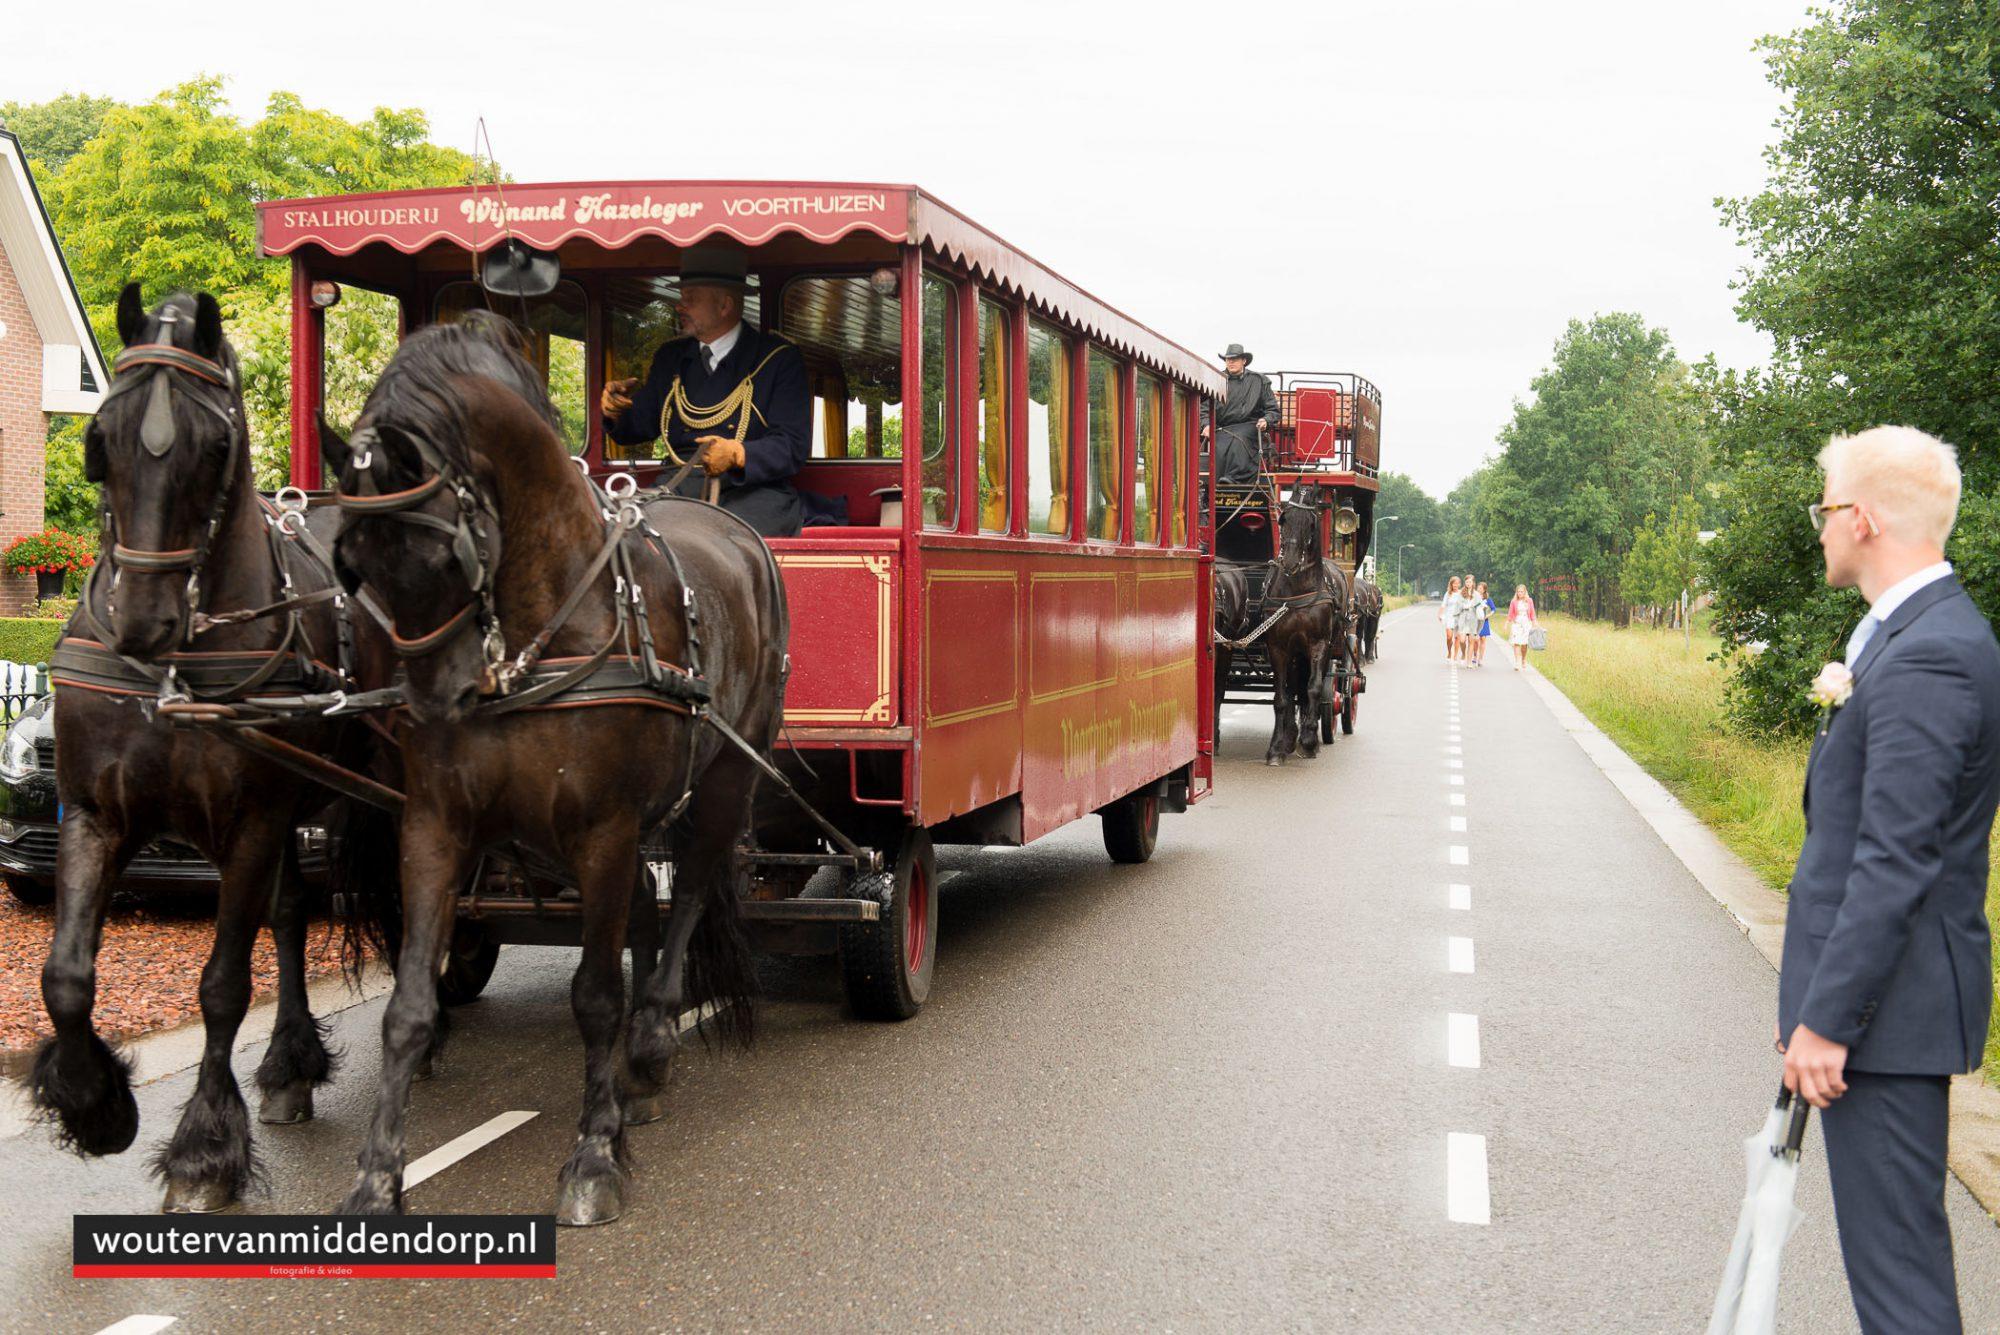 trouwfotograaf-wouter-van-middendorp-omgeving-veluwe-barneveld-uddel-53-van-54